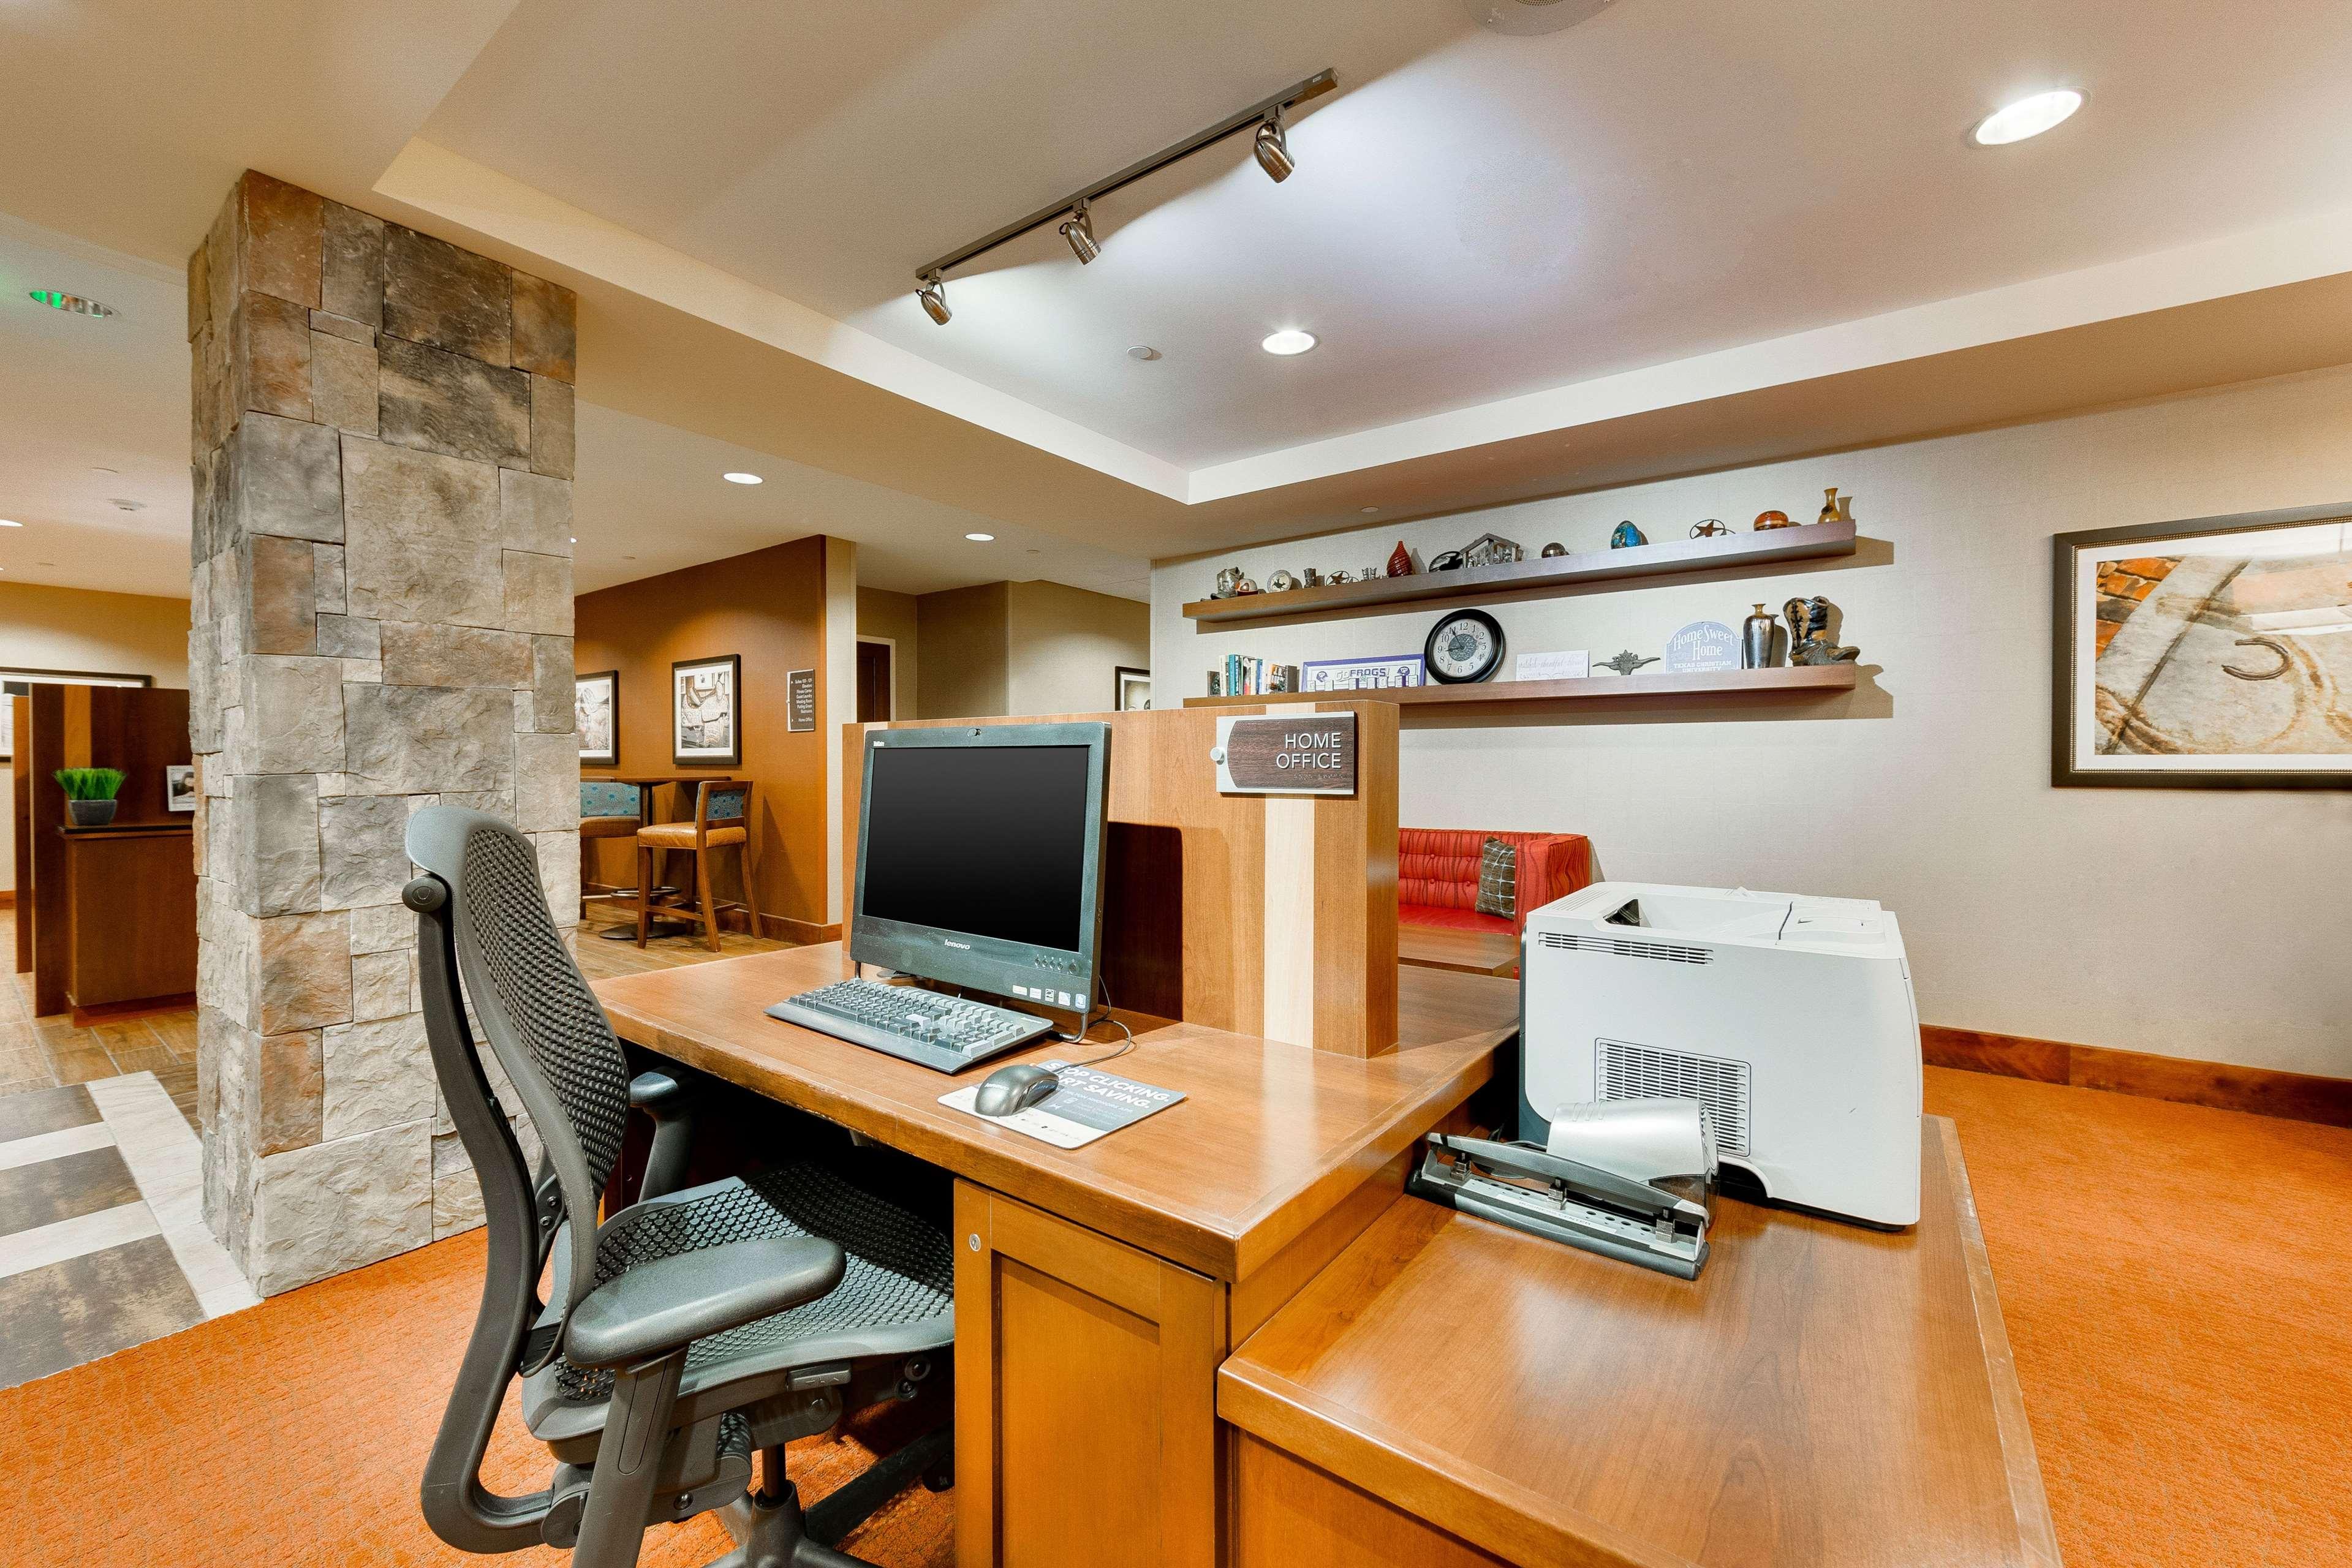 Homewood Suites by Hilton Fort Worth - Medical Center, TX image 27